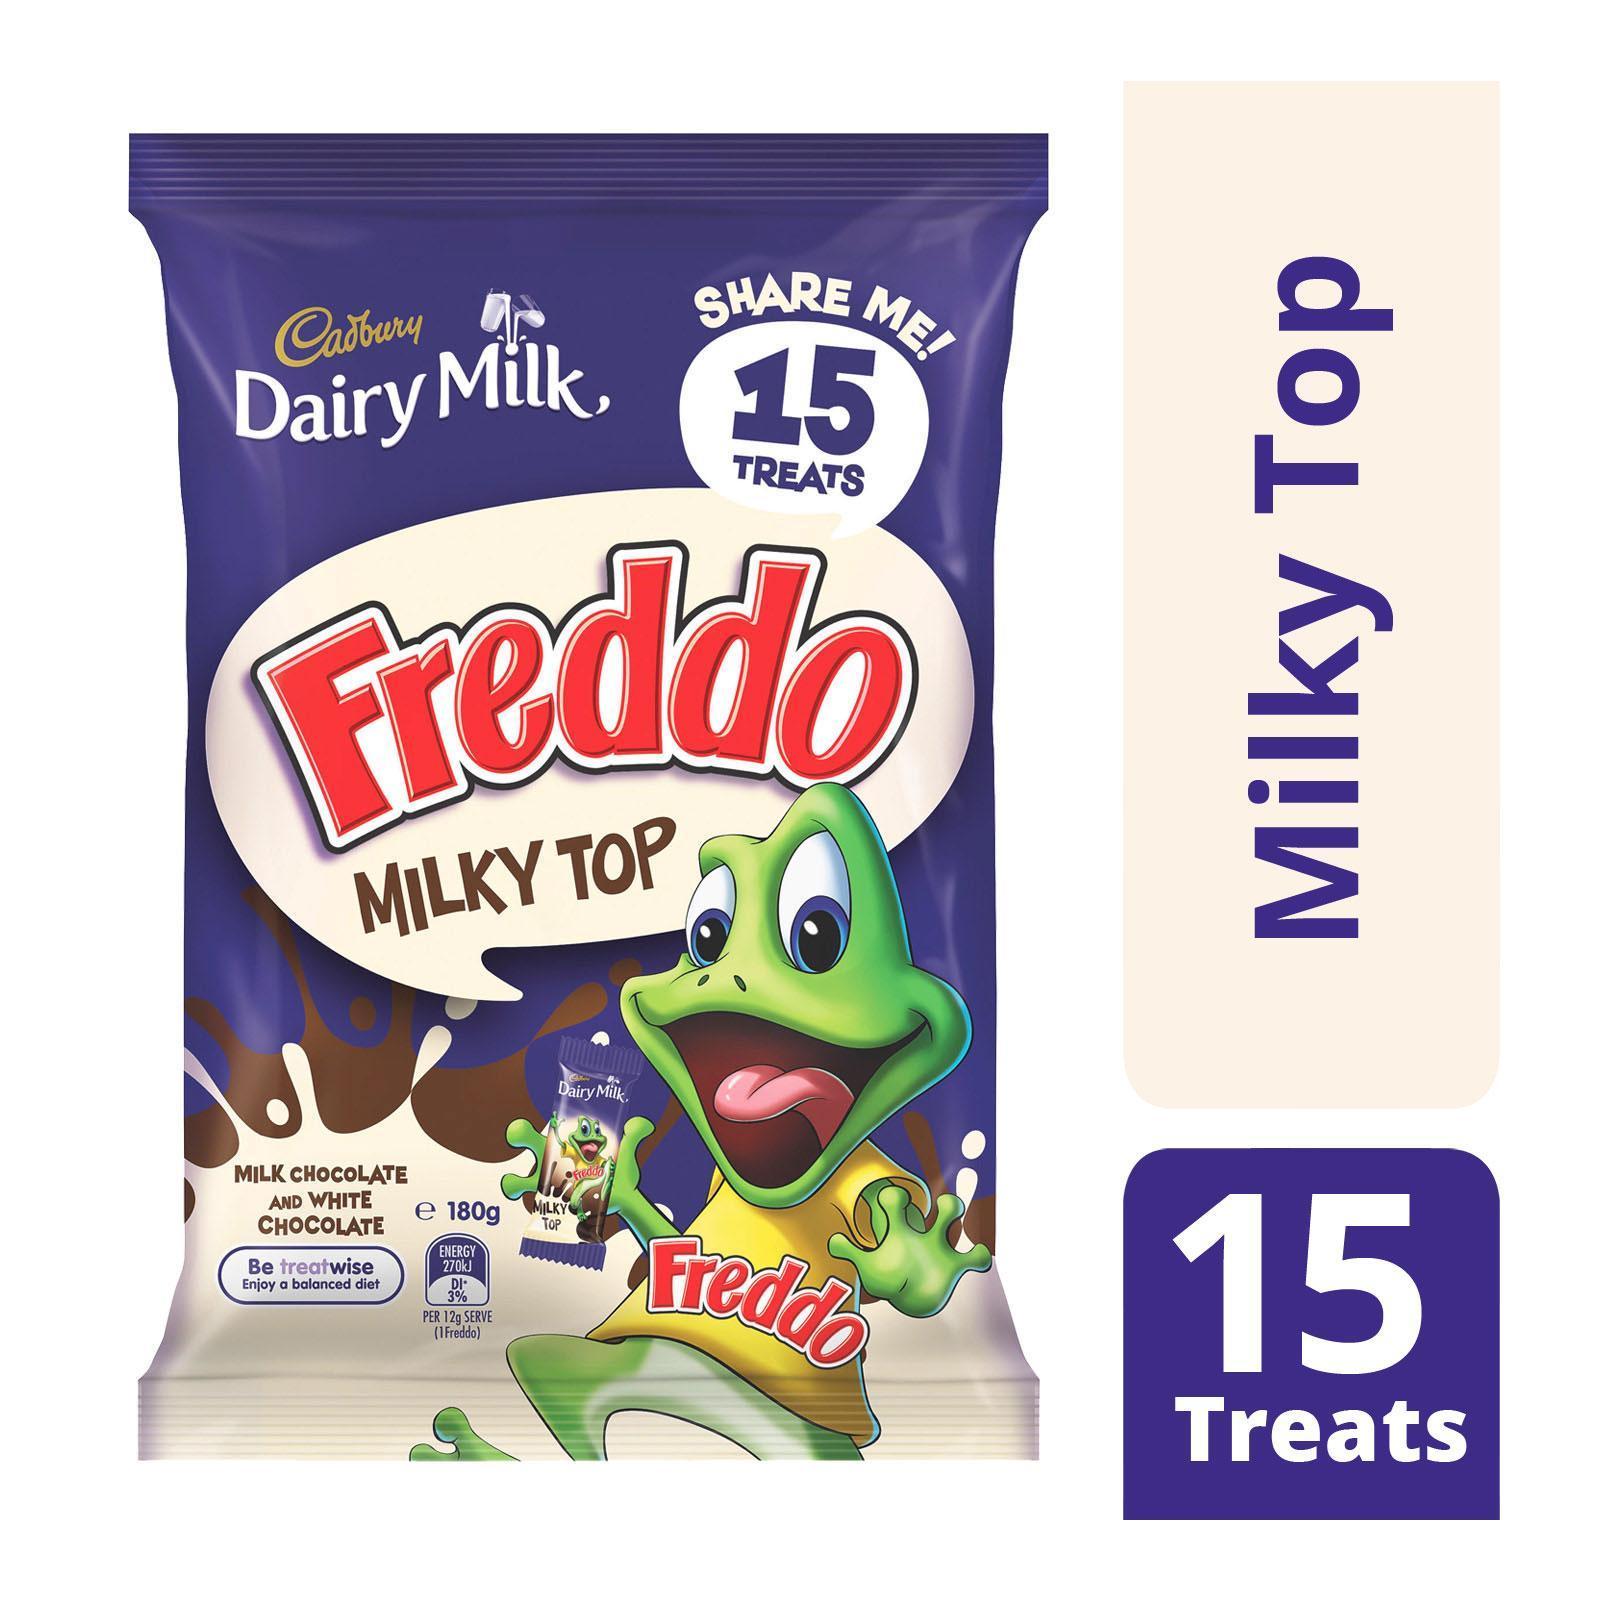 Cadbury Dairy Milk Freddo Milky Top/Milk Chocolate And White Chocolate - Multipack